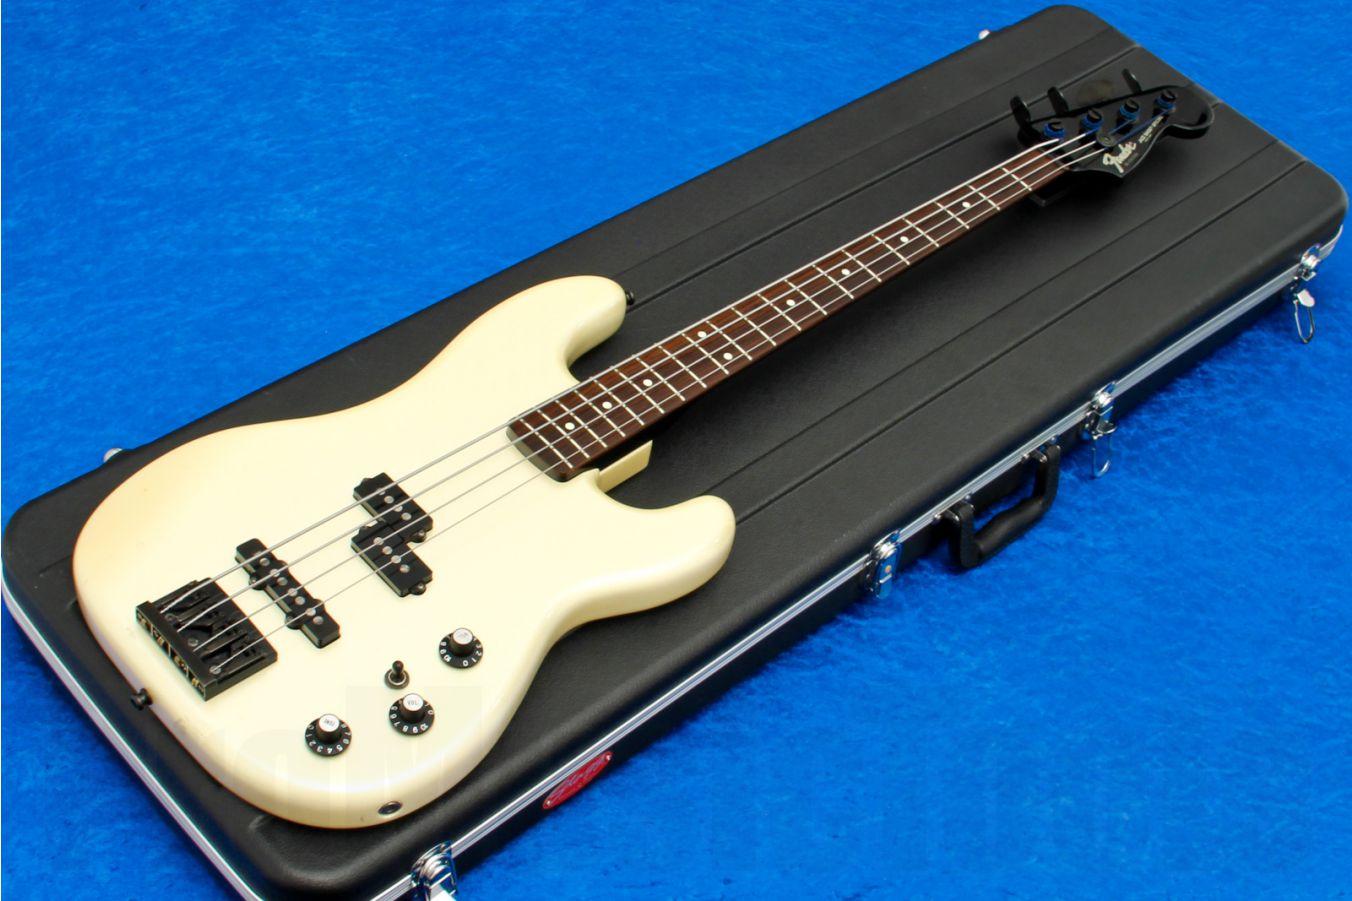 Fender Jazz Bass Special PJ - Made in Japan